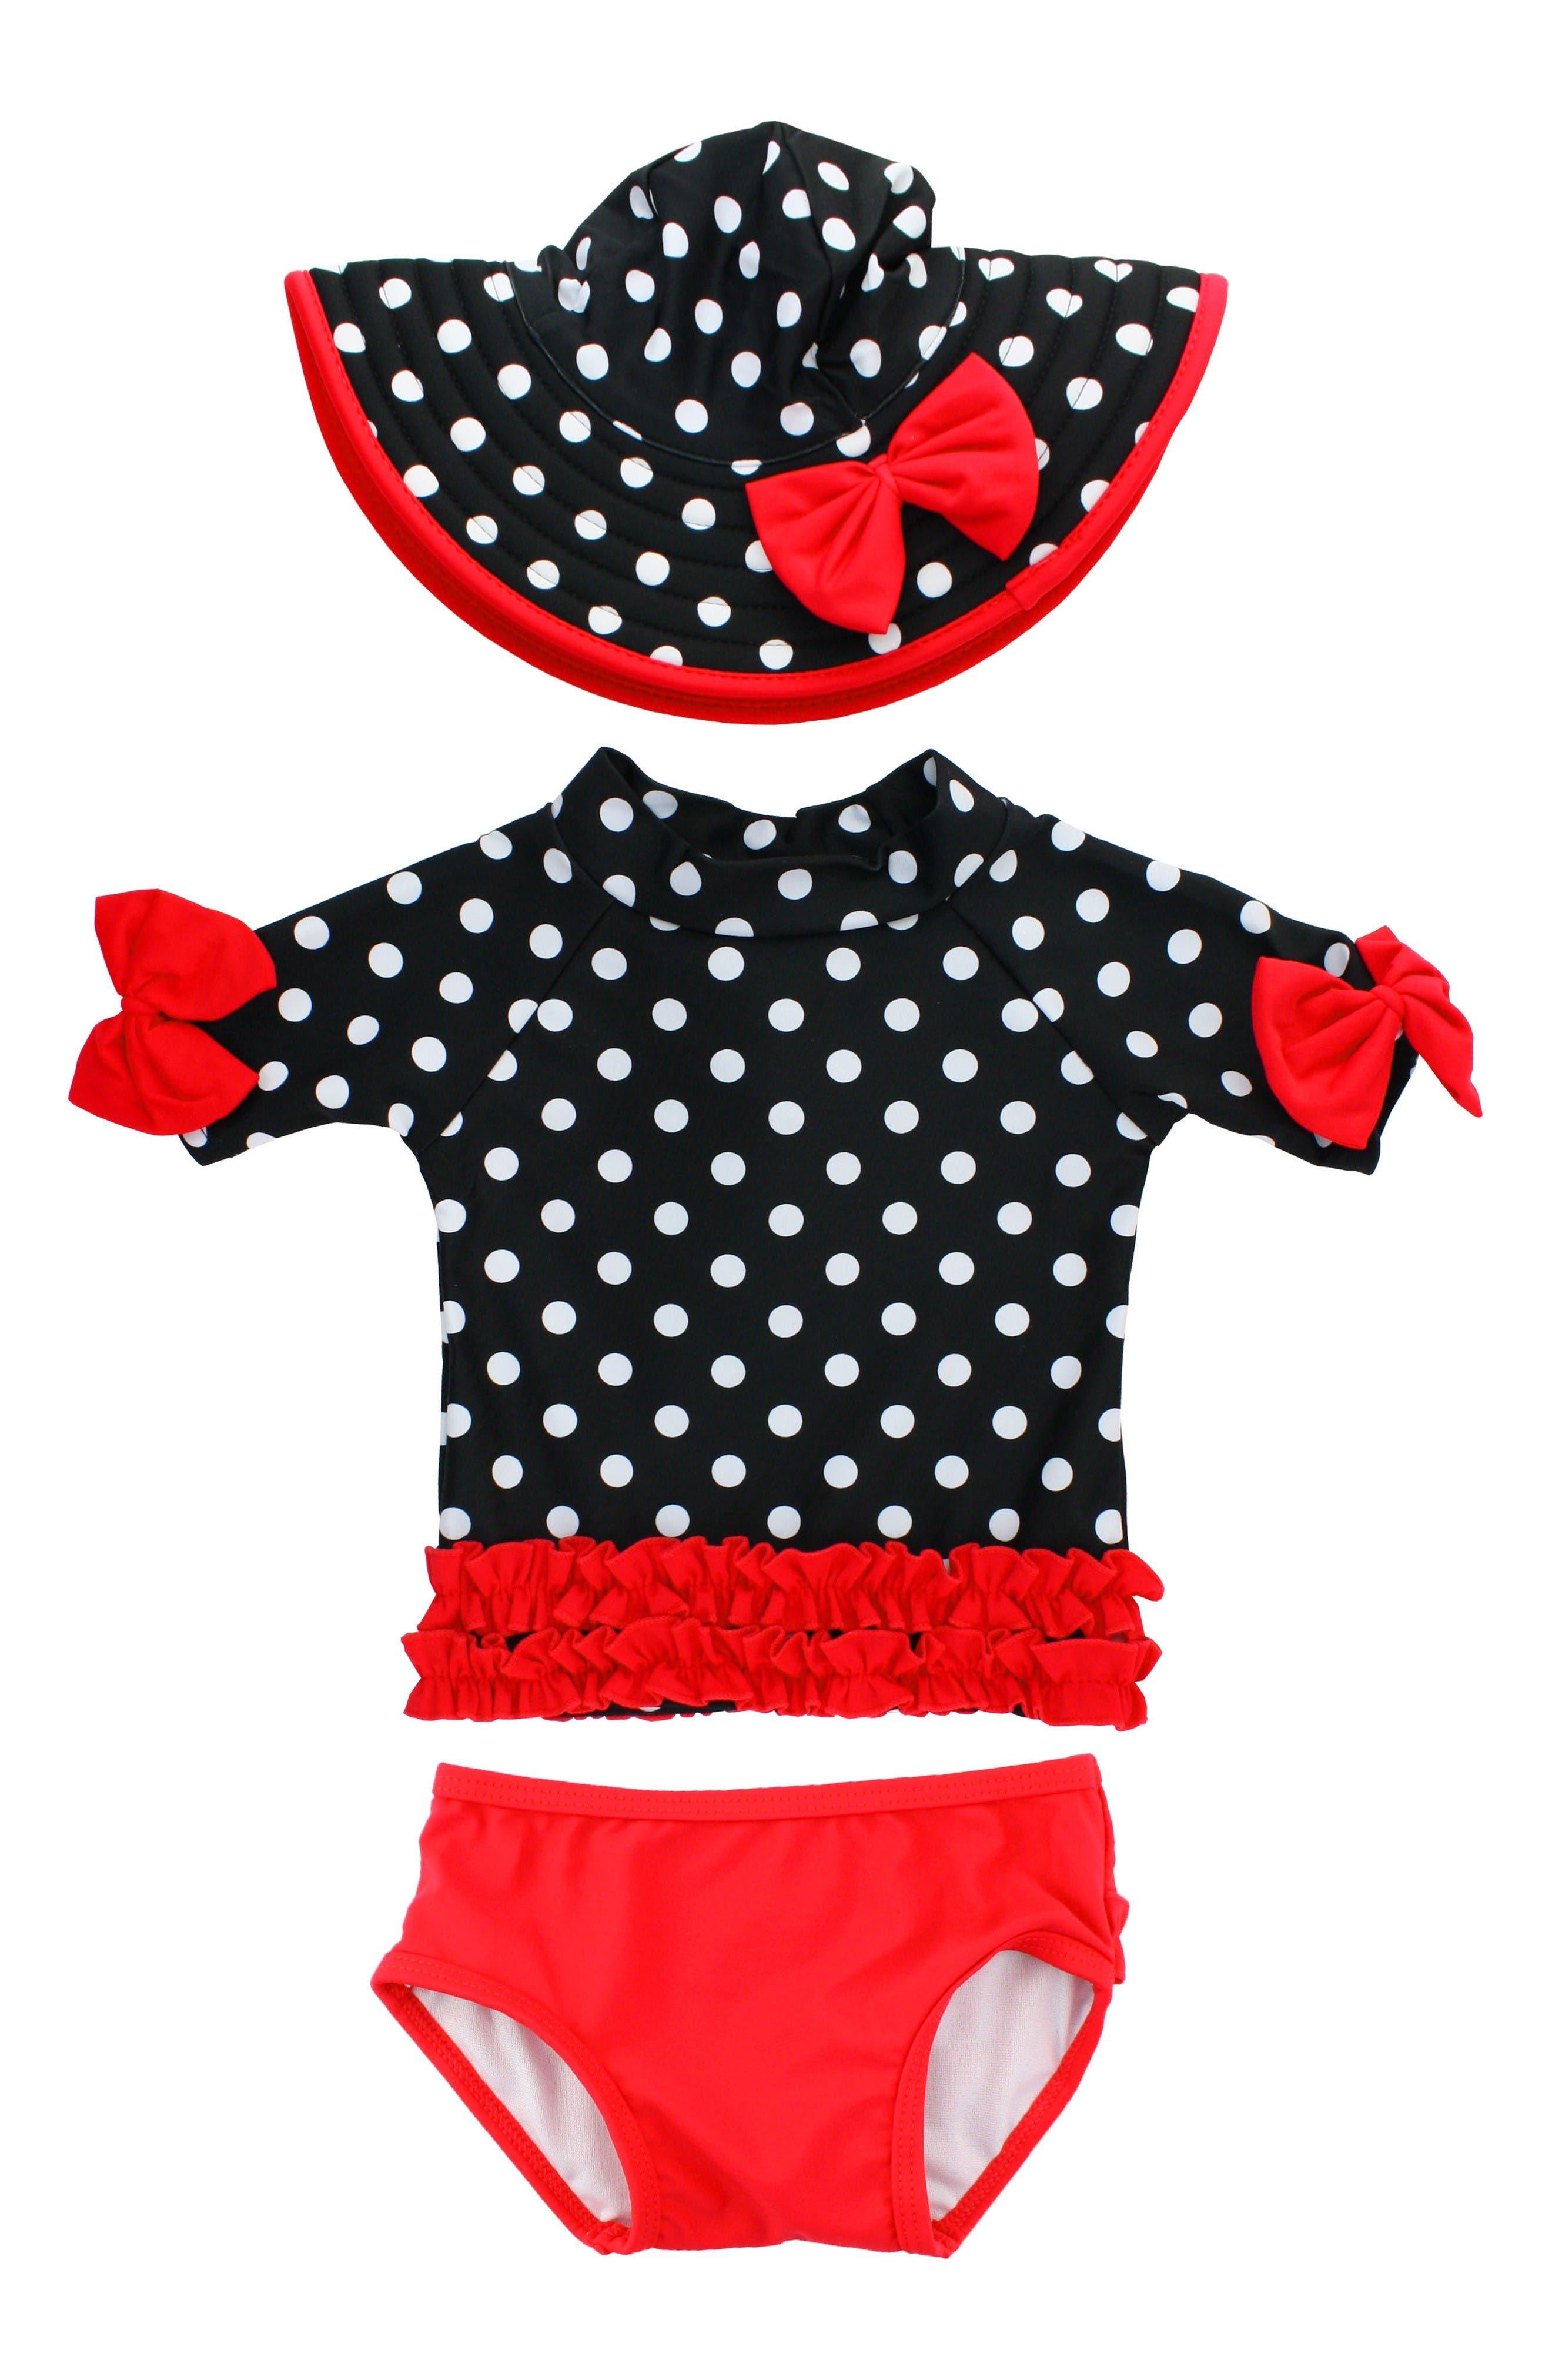 Ruffle Butts Vintage Two-Piece Rashguard Swimsuit & Hat Set (Baby Girls)